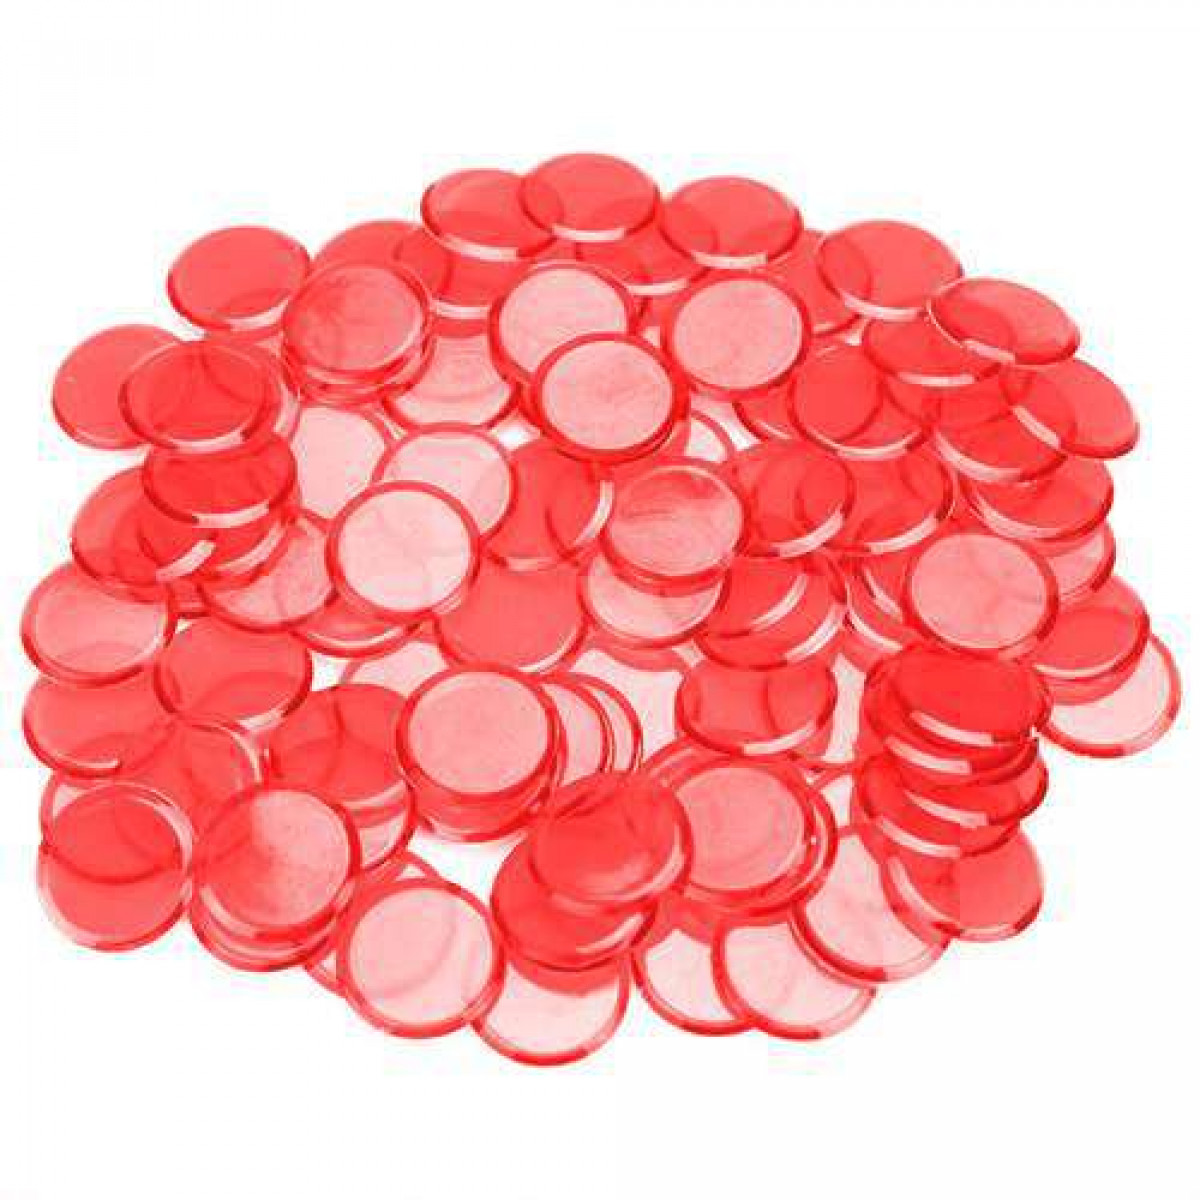 bingo chips Royal bingo supplies 1000 pack of bingo chips (mixed) – bulk set of ¾-inch  translucent markers for bingo, counting & game tokens, great for bingo halls.